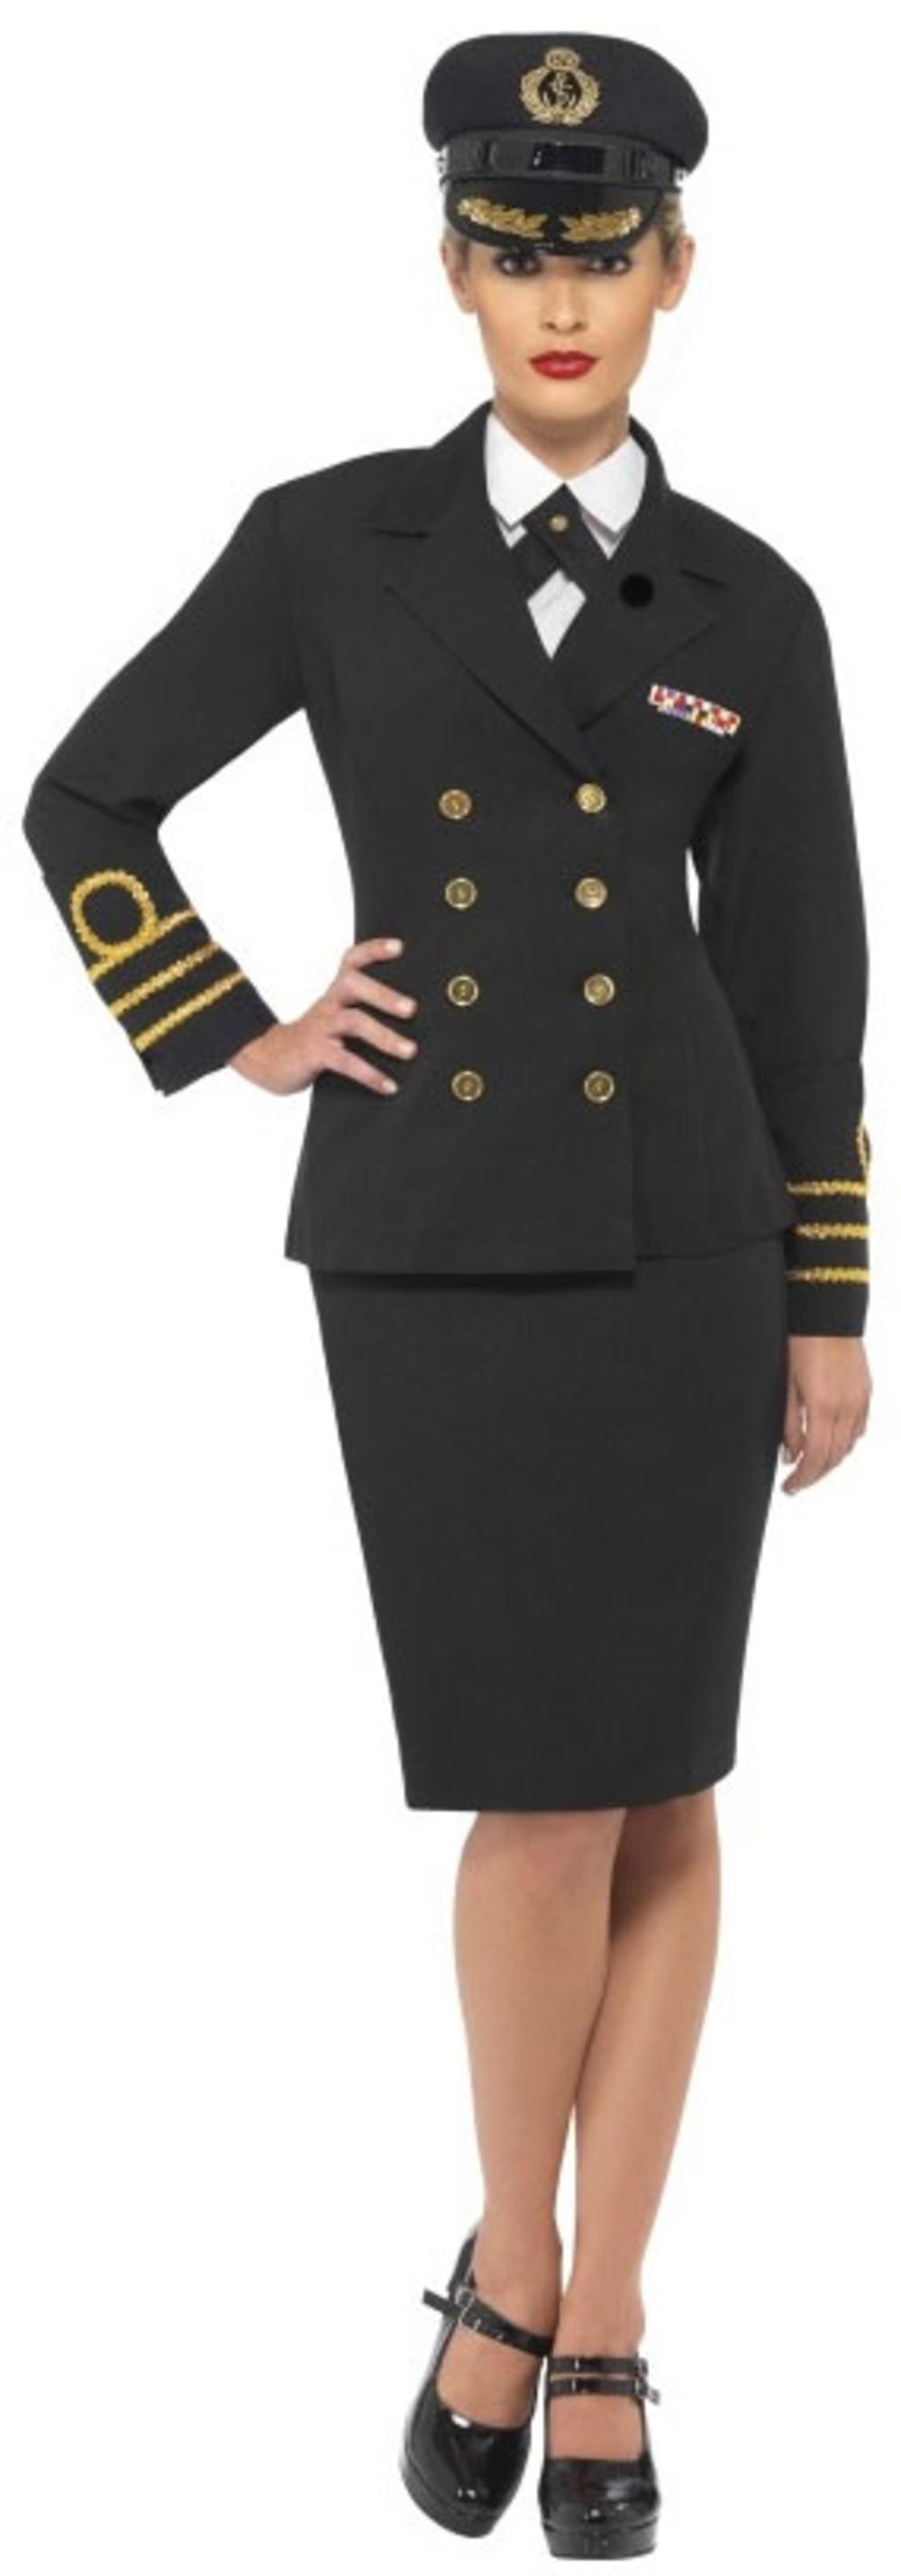 Women's' Navy Officer Uniform Fancy Dress Costume